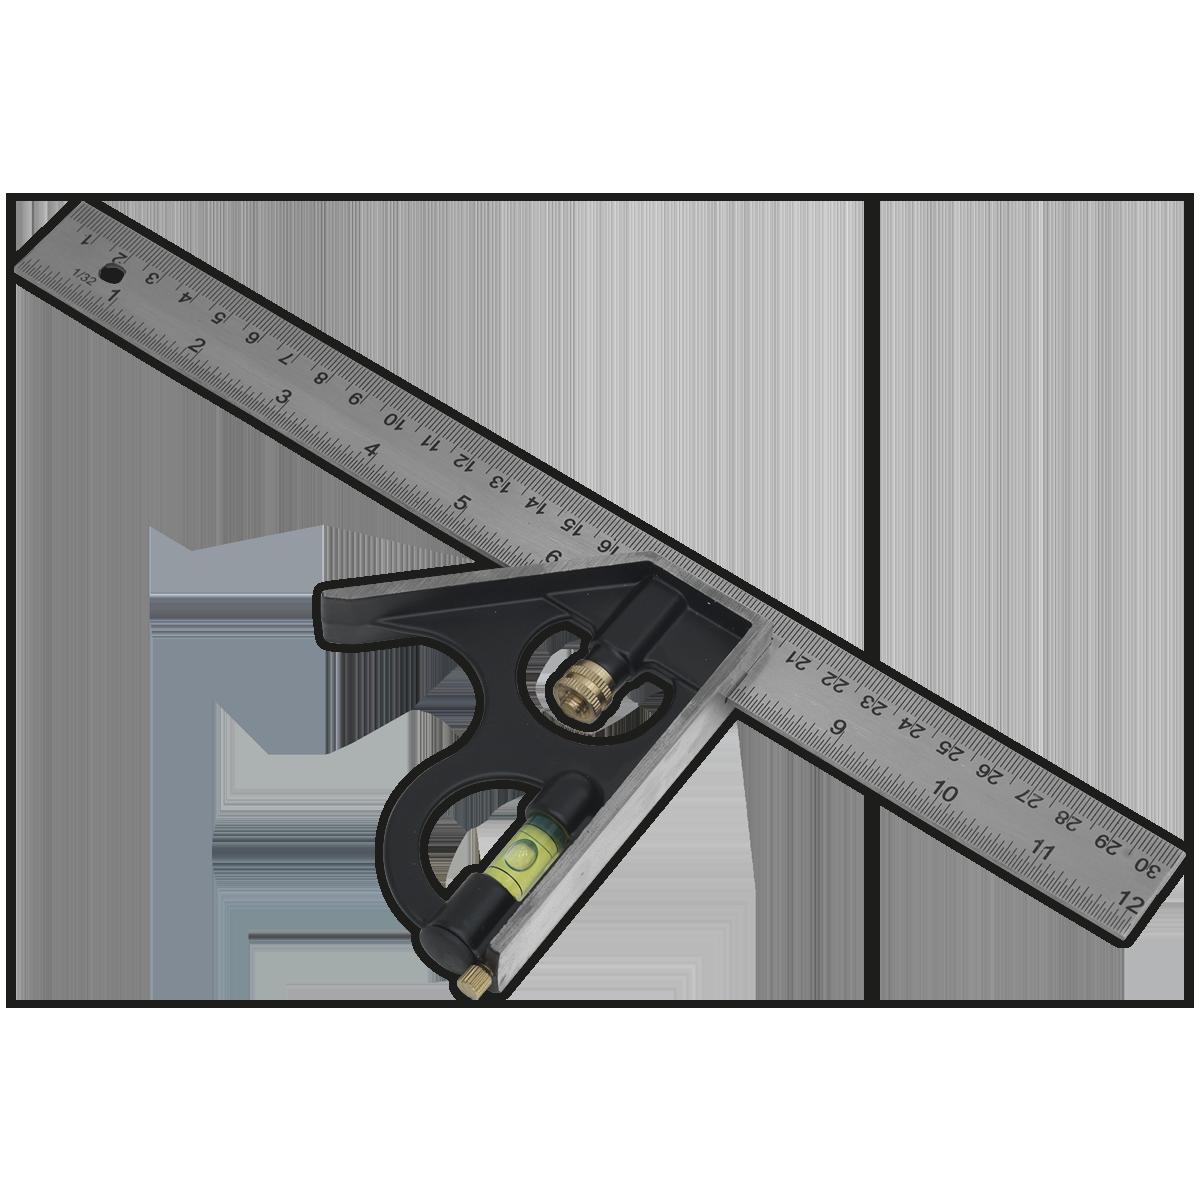 Combination Square 300mm